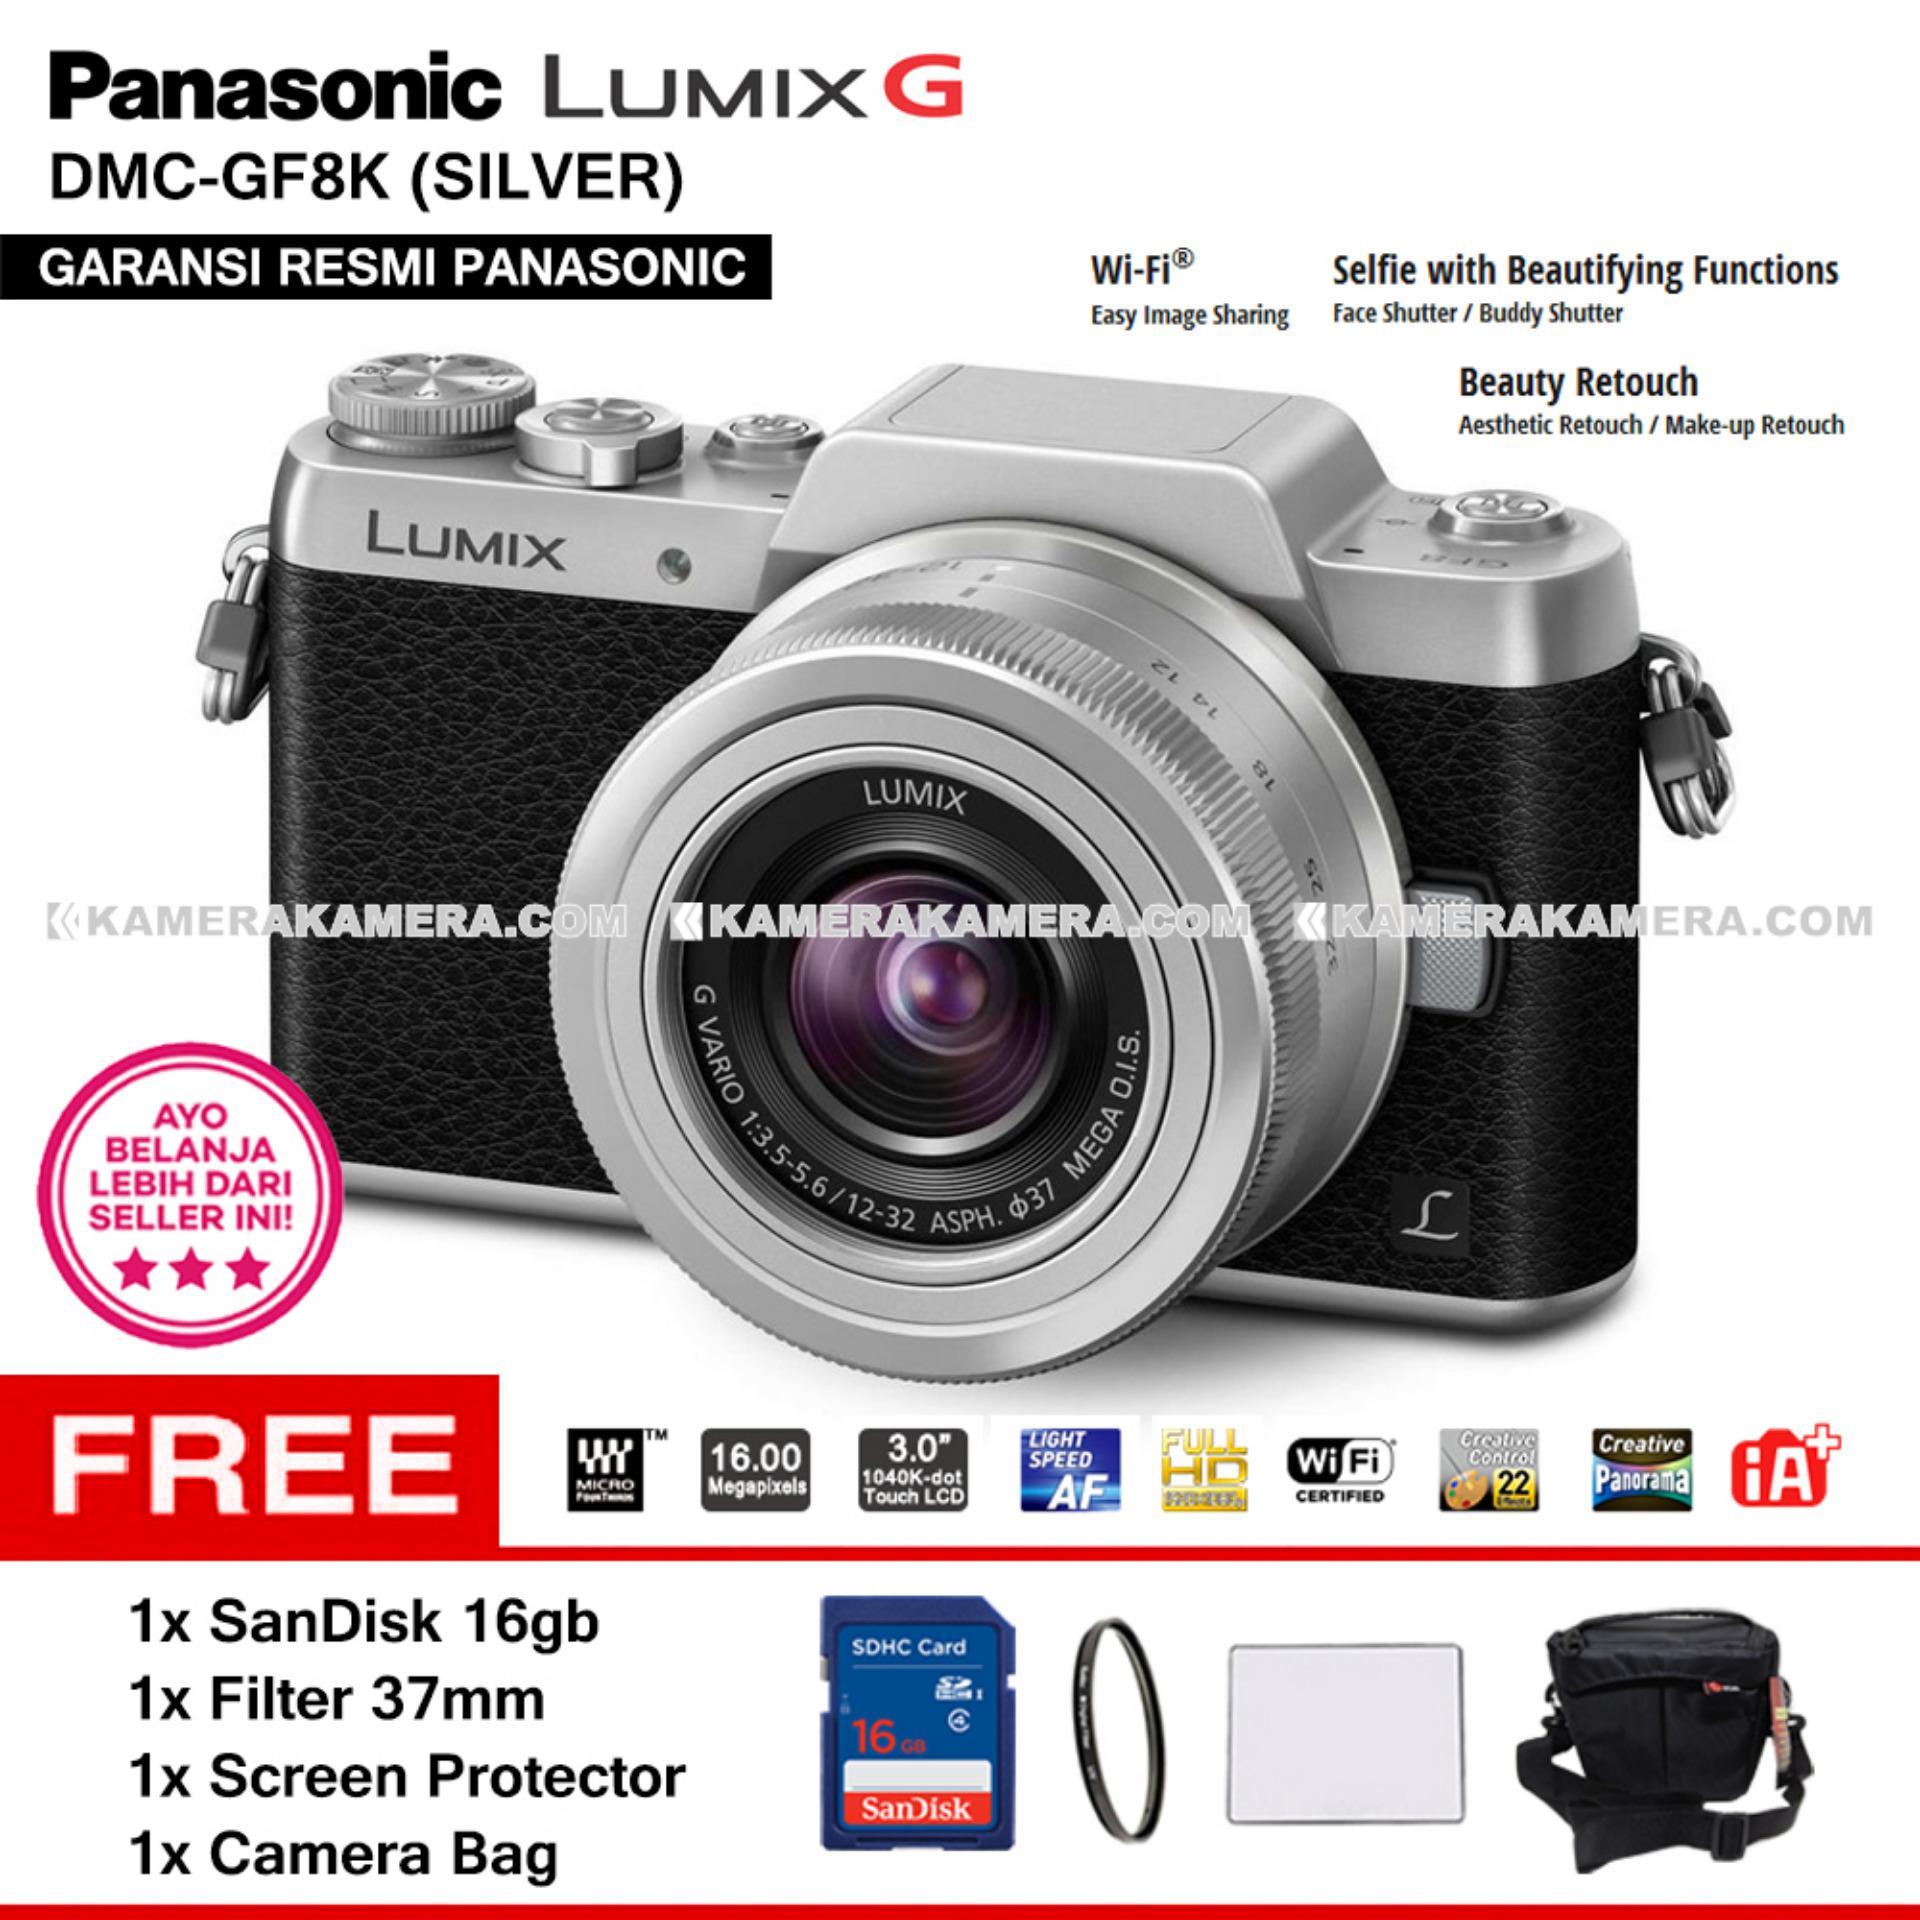 Murah Panasonic Lumix G Dmc Gf8 Orange Body Only International Kit 12 32mm Paket Gf8k Silver With Vario Wifi